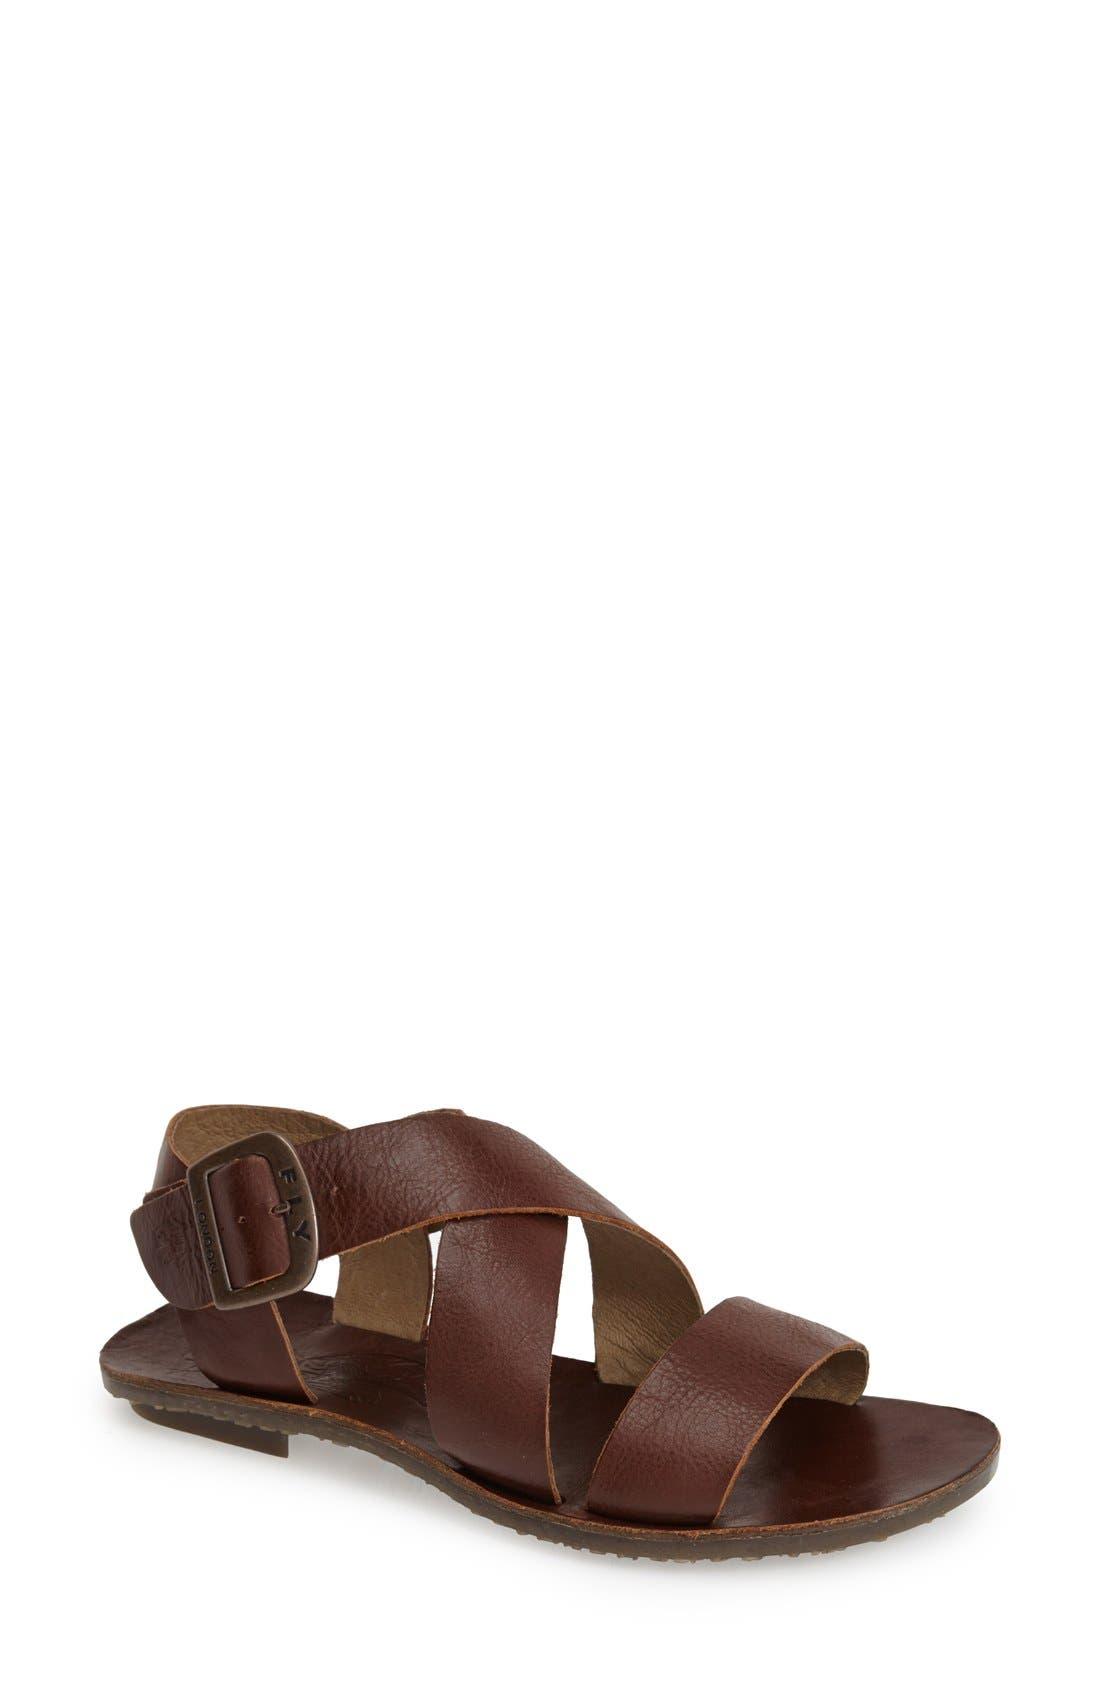 Alternate Image 1 Selected - Fly London 'Bian' Flat Leather Sandal (Women)